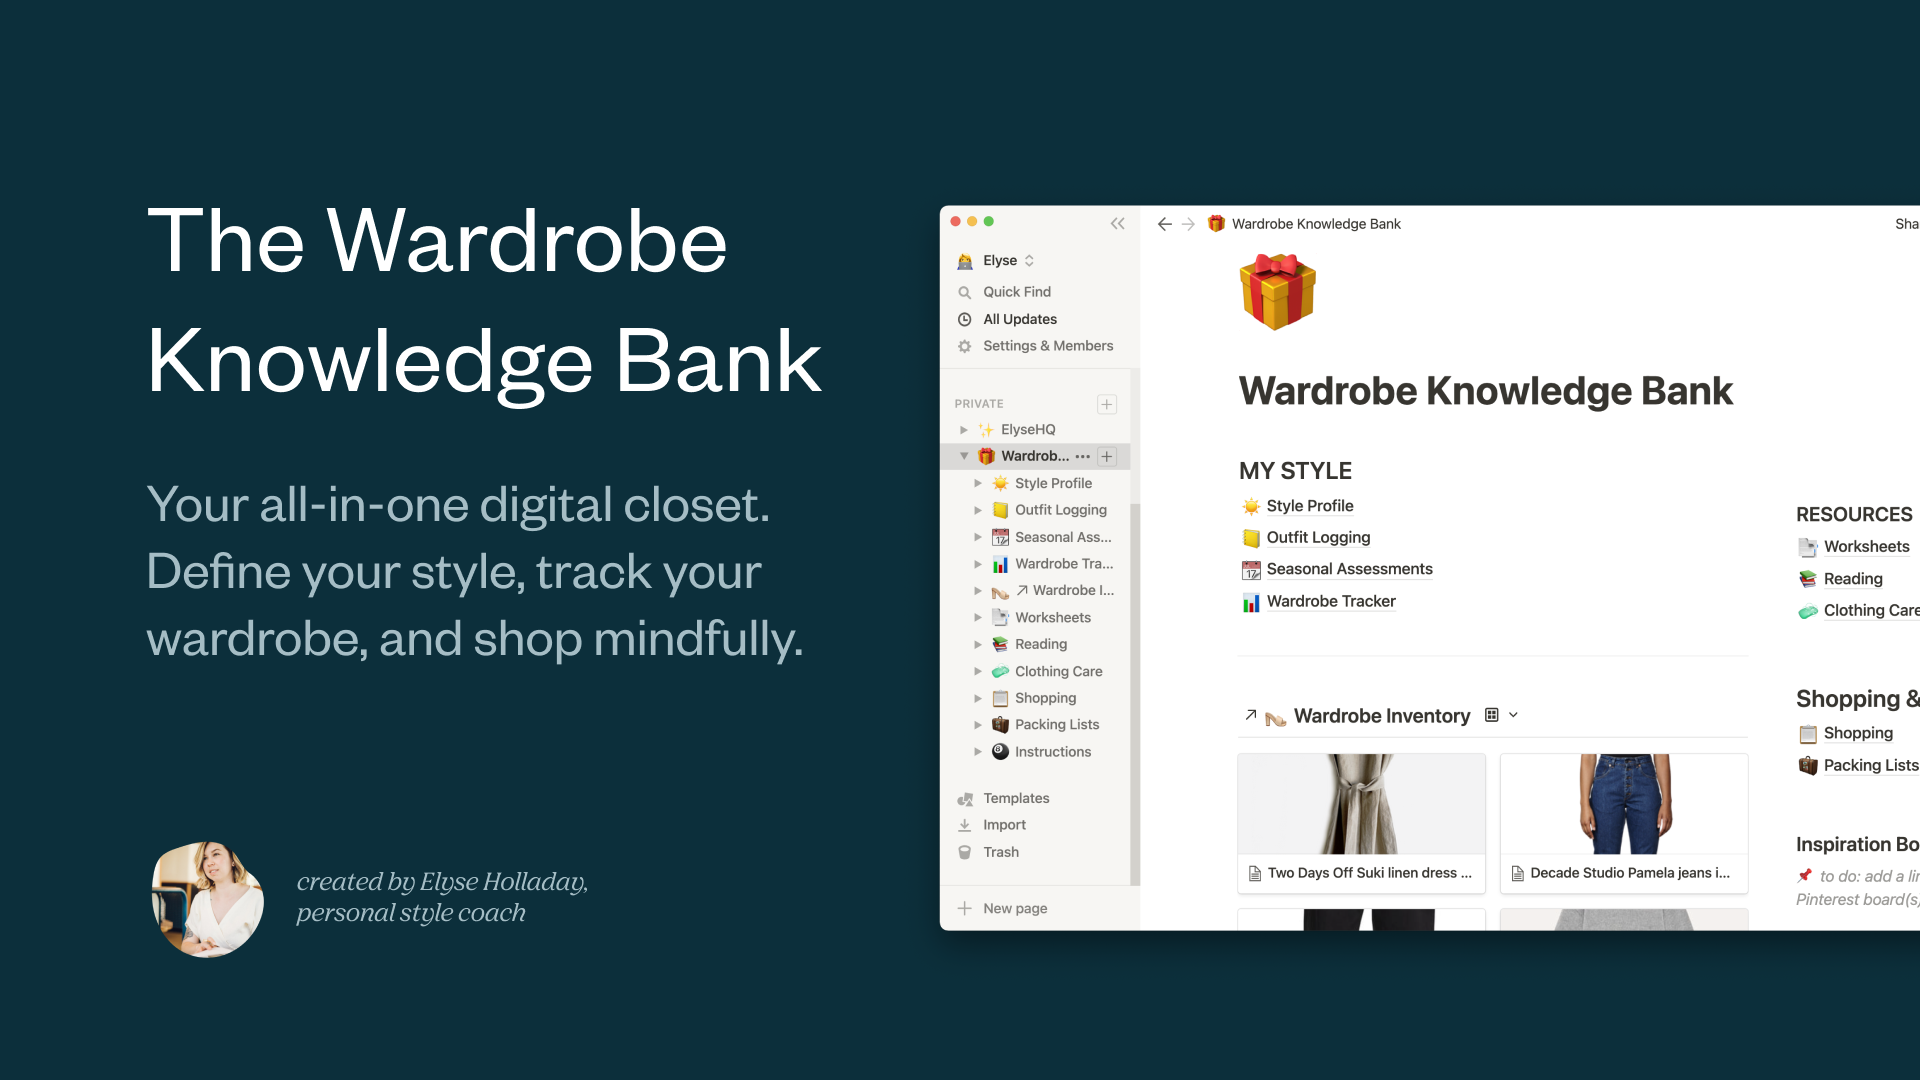 Wardrobe Knowledge Bank